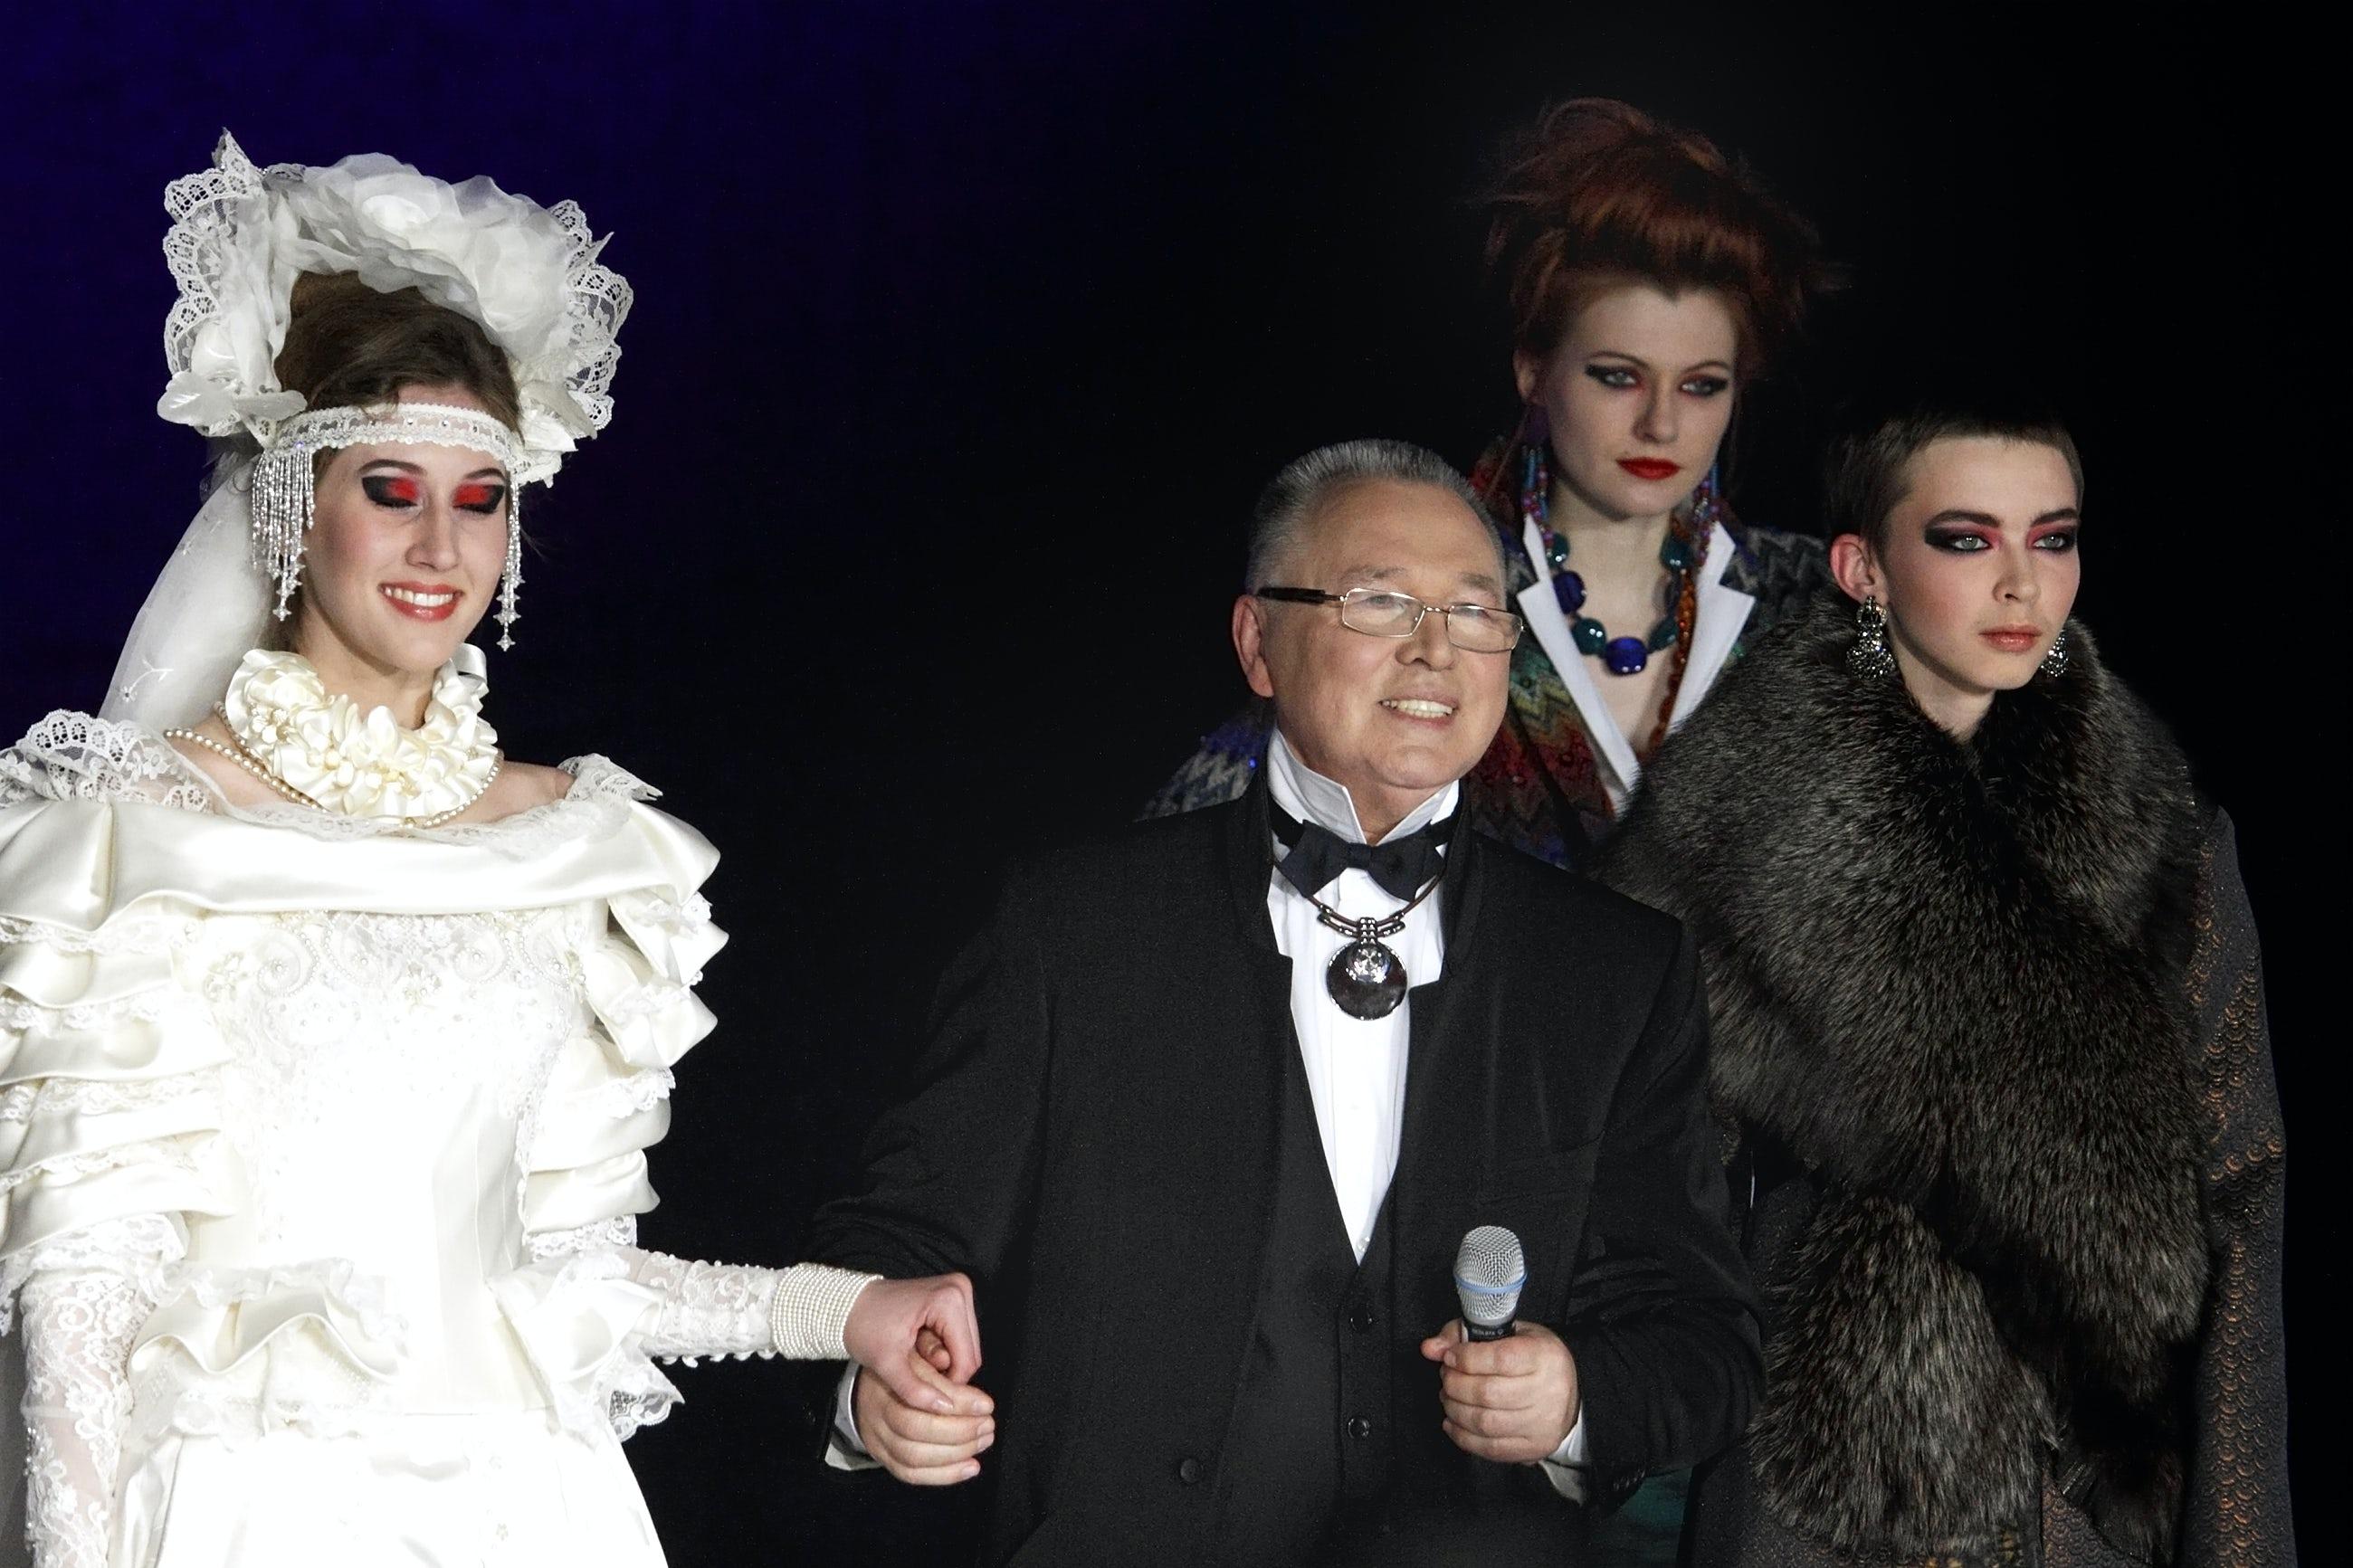 Slava Zaitsev and models | Source: Shutterstock